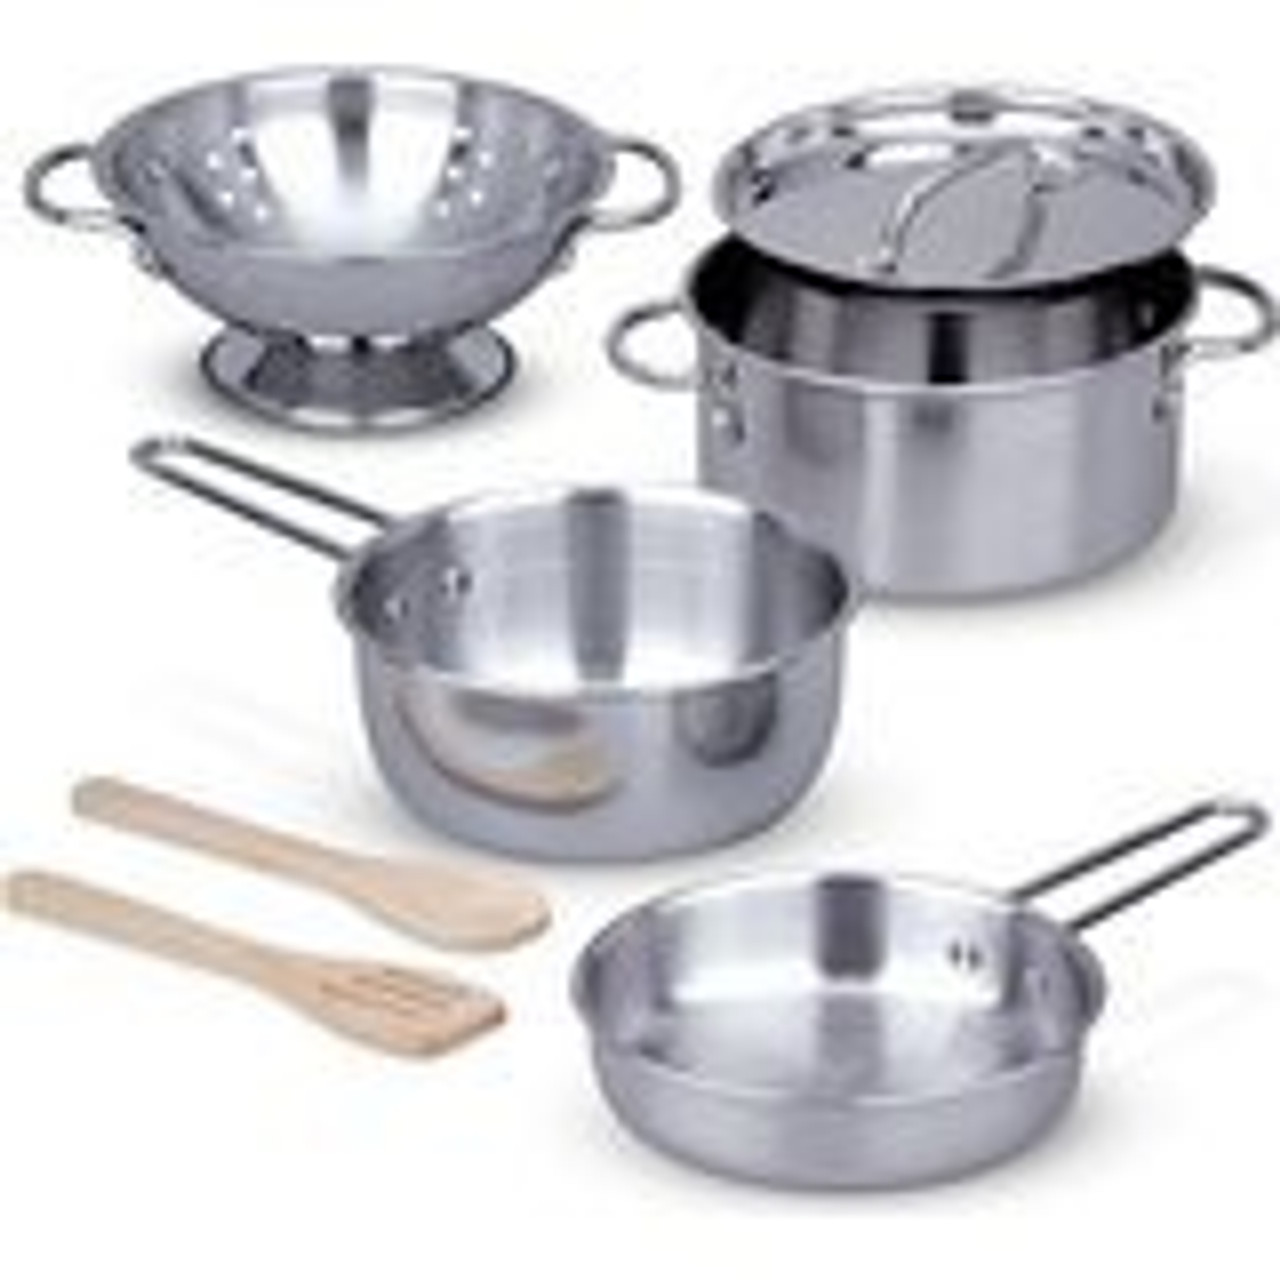 LET'S PLAY HOUSE! POTS & PANS